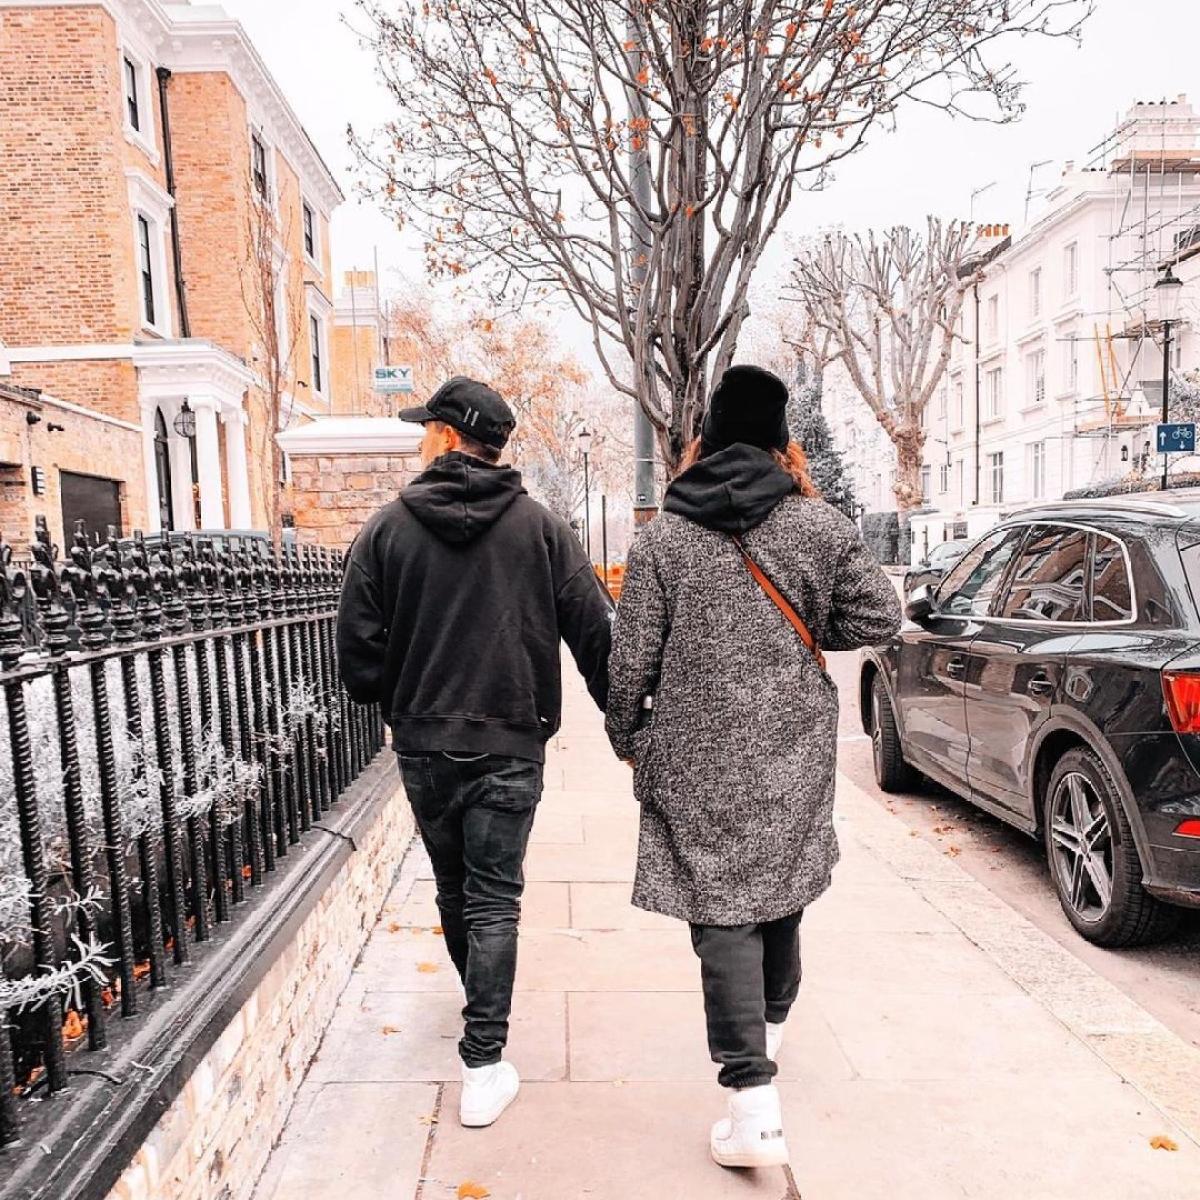 'I love you meri jaan': Priyanka Chopra and Nick Jonas get mushy on 2nd wedding anniversary, share loved-up posts